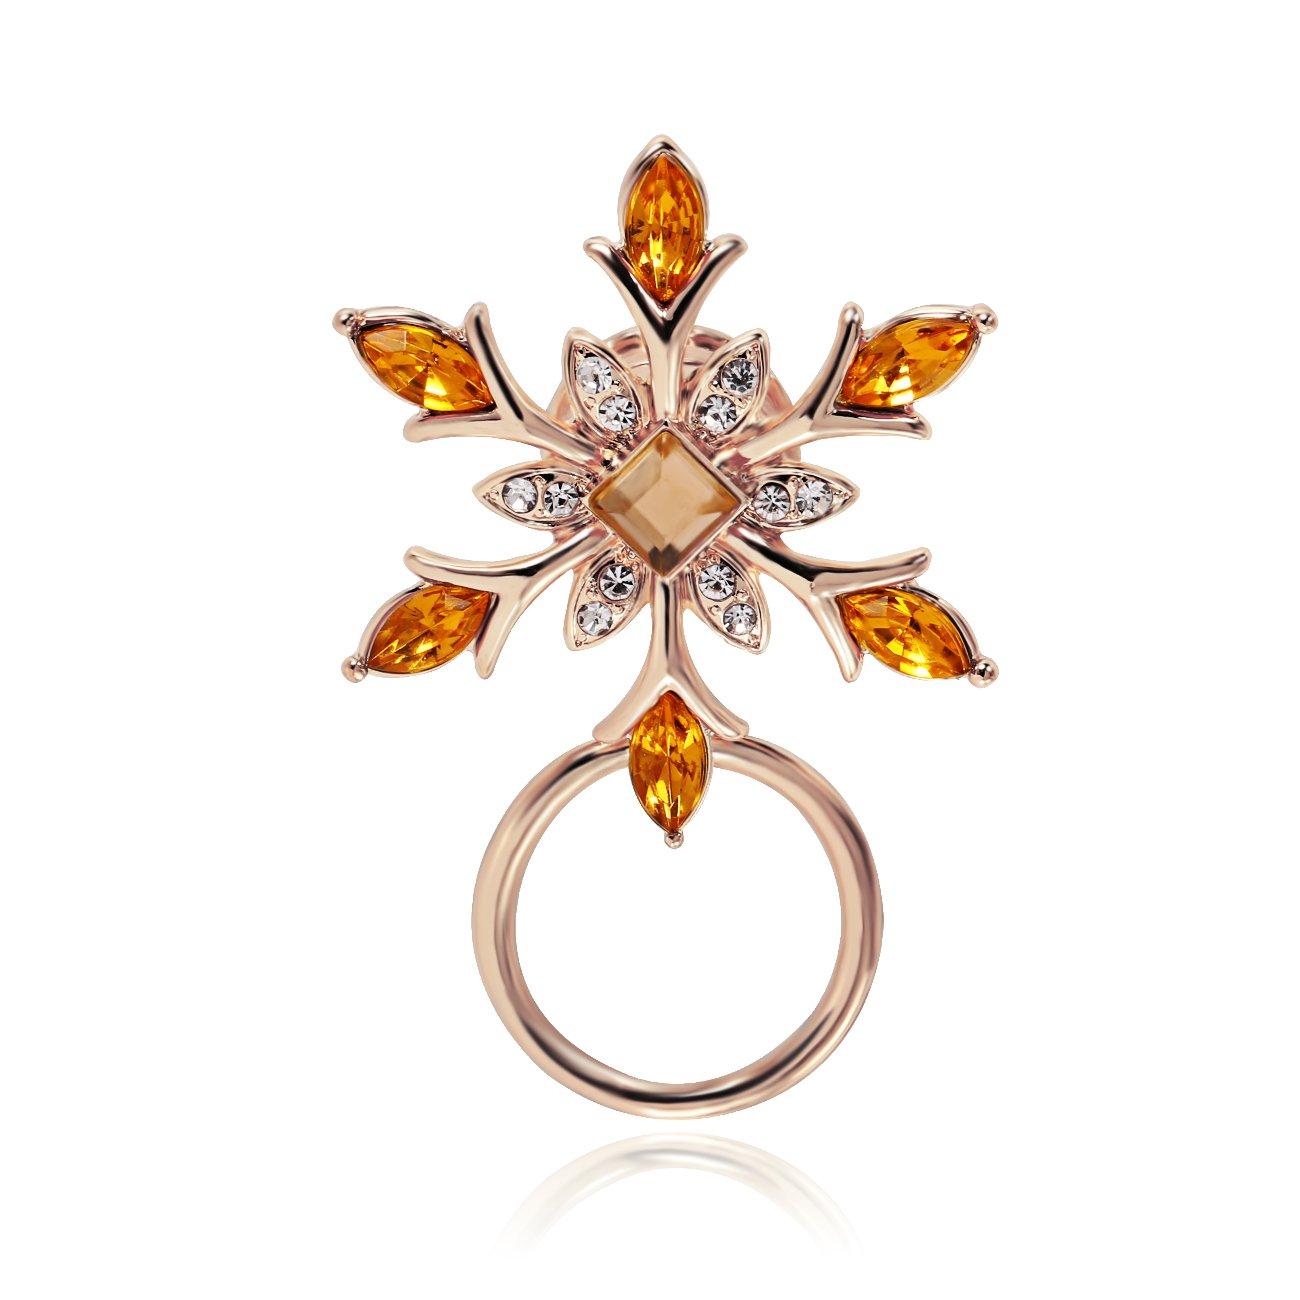 PANGRUI Winter Holiday Snowflake Flower Brooch Magnetic Eyeglasses Holder (Rose Gold)